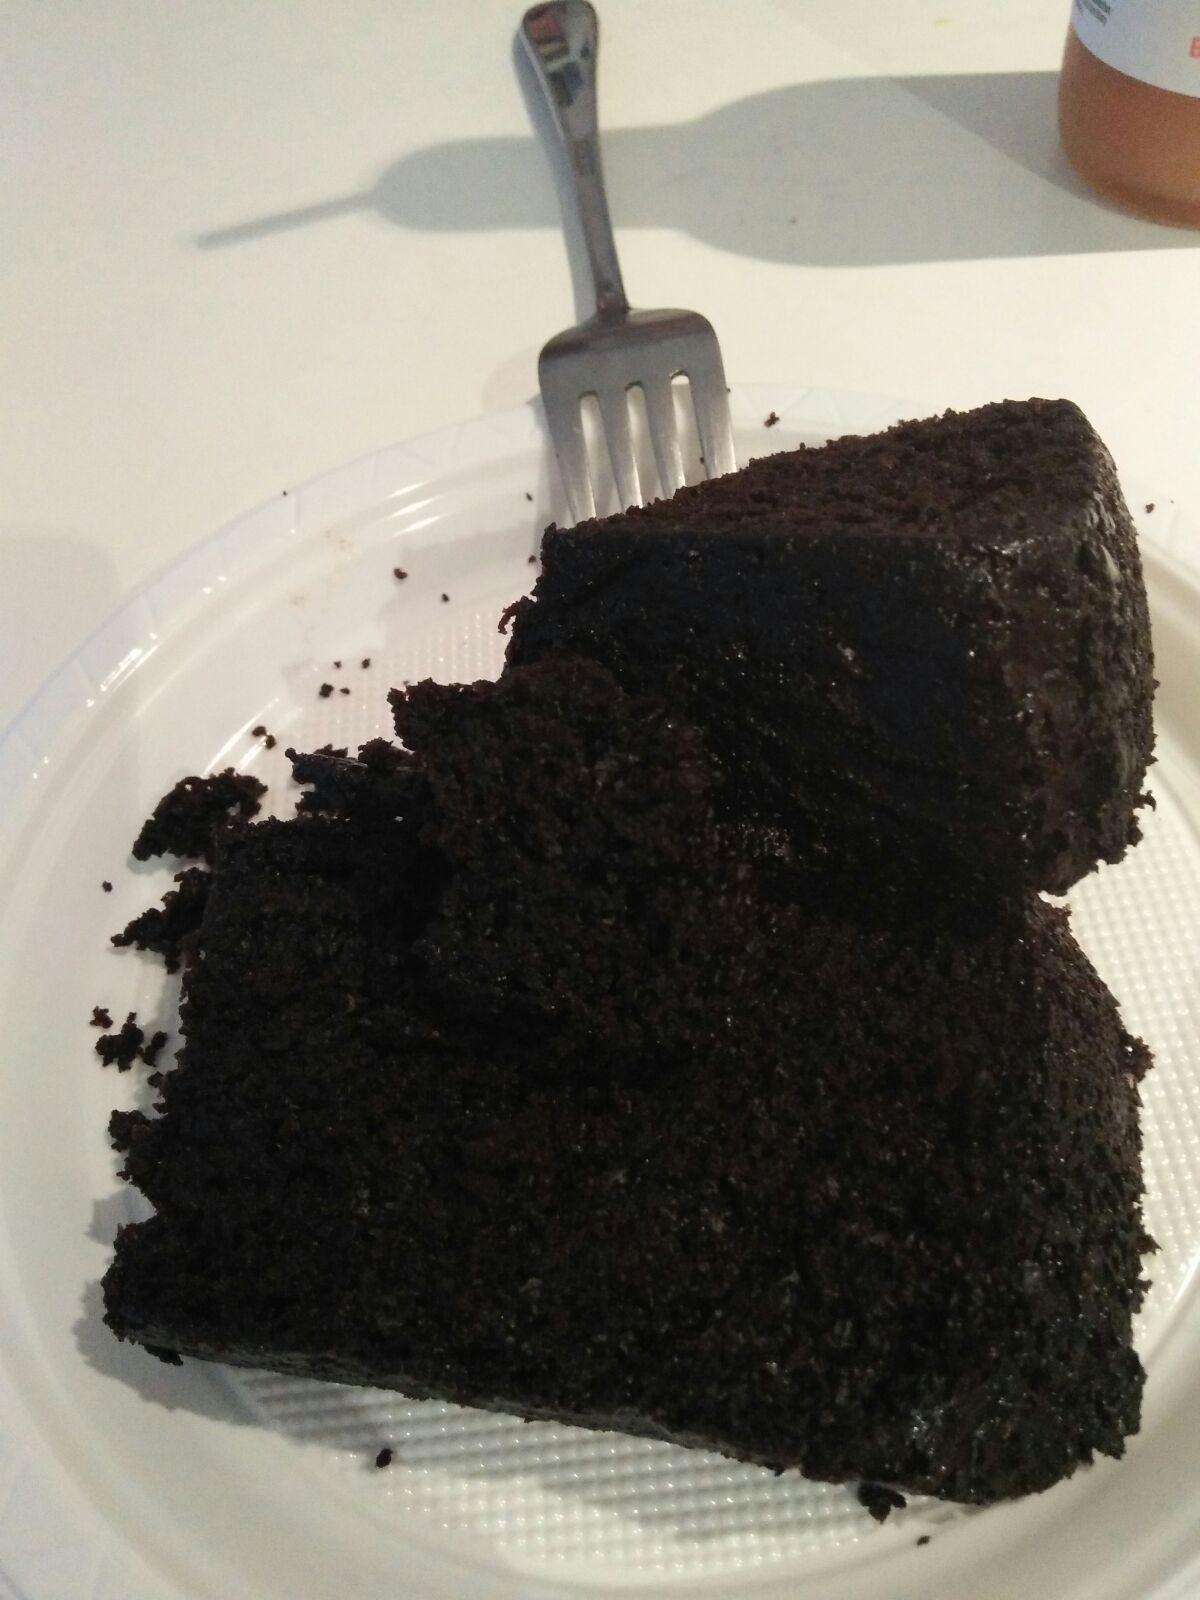 Burnt choco coffee cake cut up